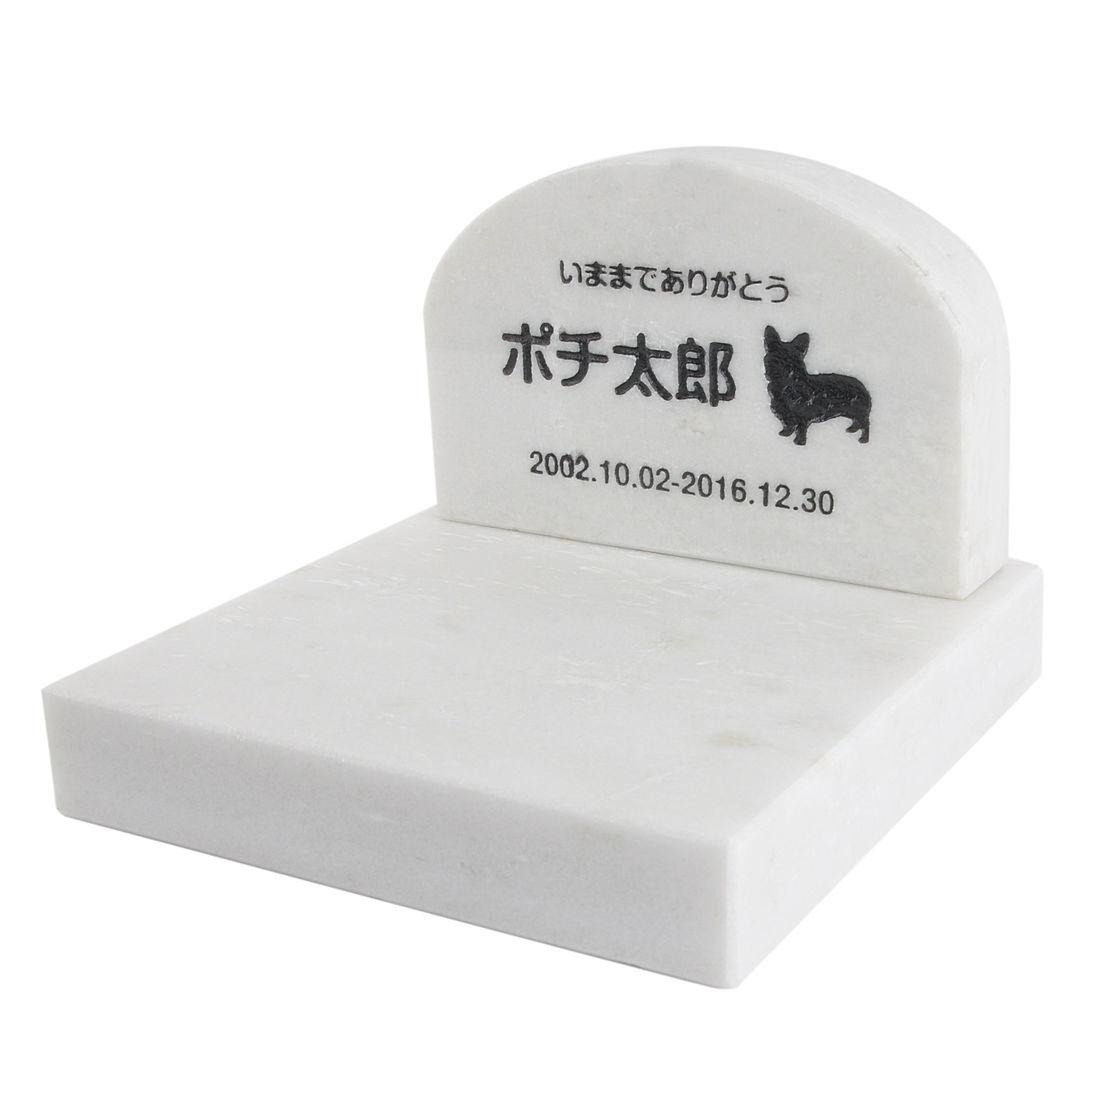 Pet&Love. ペットのお墓 天然石製 セット型 底板が厚く重いタイプ 大理石 ホワイト アーチ  【HLS_DU】【楽ギフ_名入れ】 attr177attr ctgr2ctgr sml3sml+ctgr2ctgr DOG